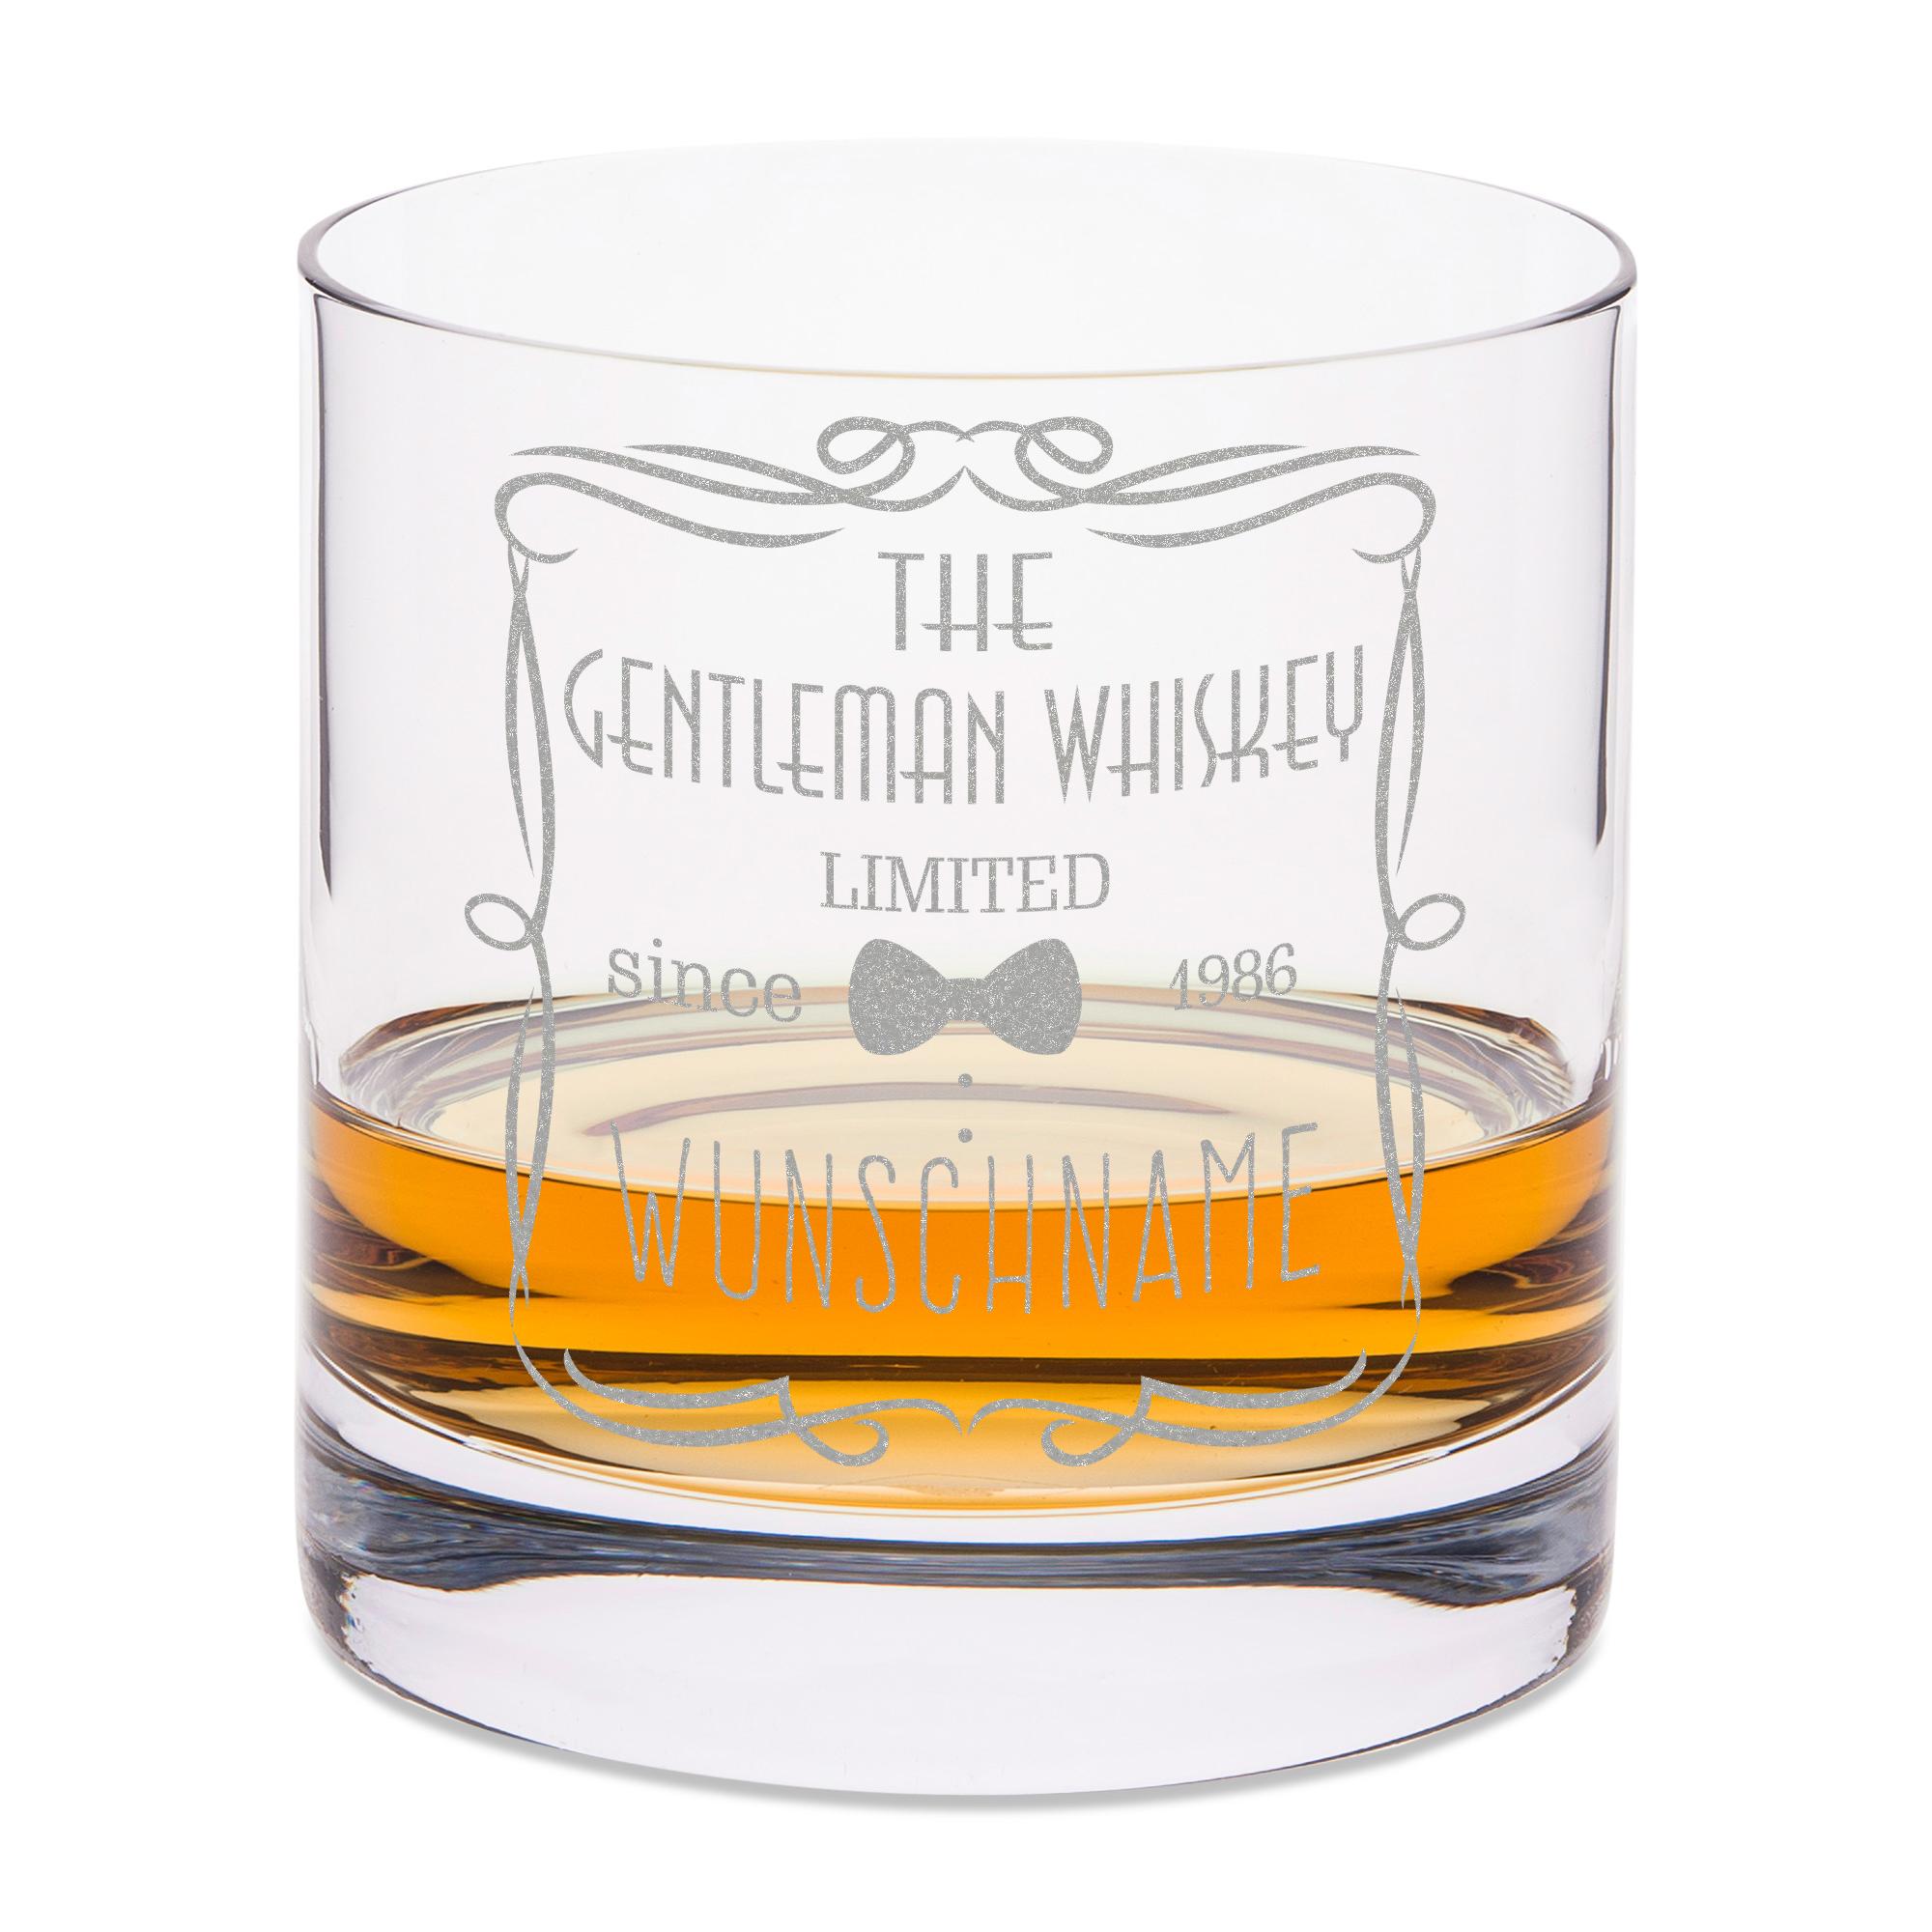 leonardo whiskyglas the gentleman whisky mit gravur. Black Bedroom Furniture Sets. Home Design Ideas